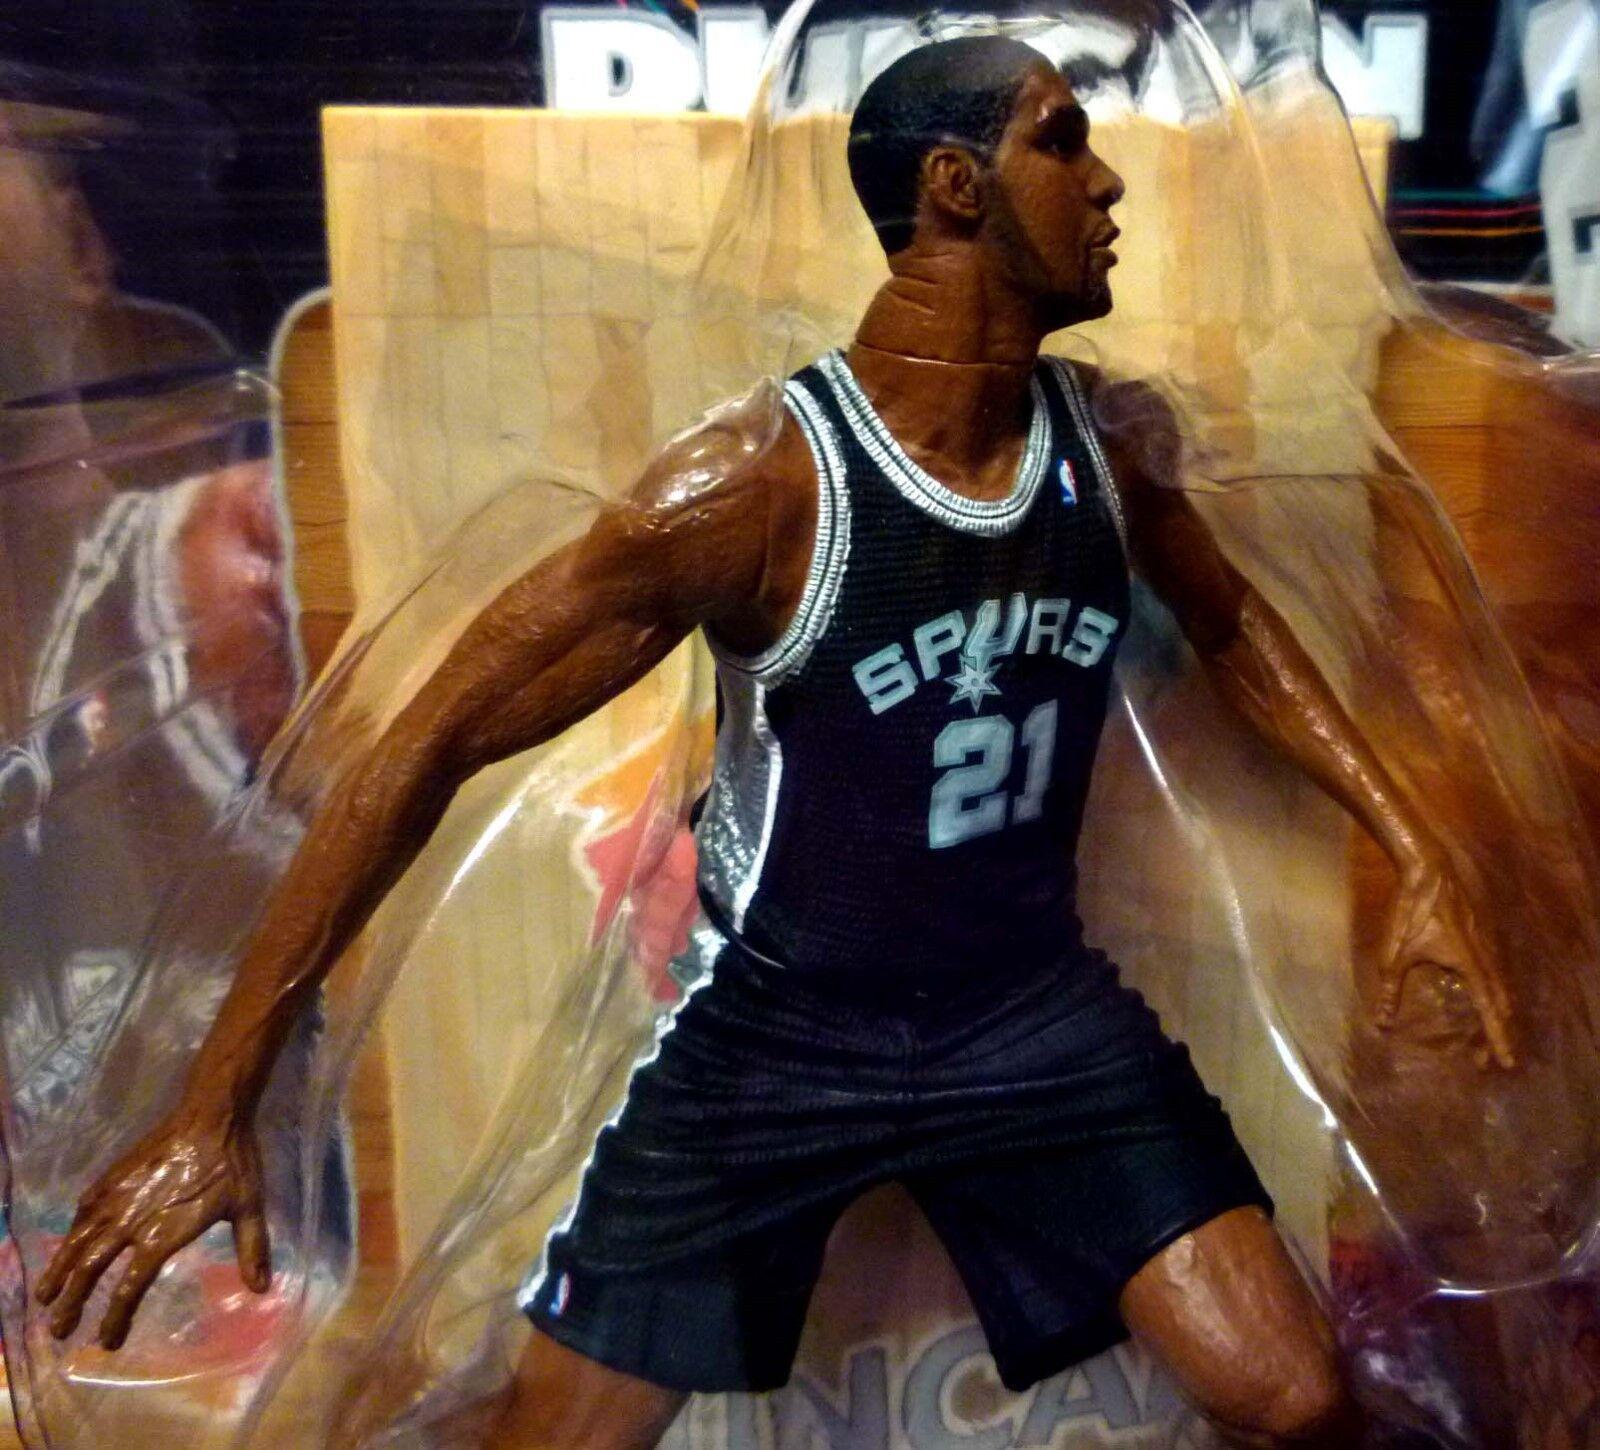 McFarlane Sports NBA NBA NBA  Basketball Series 1 Tim Duncan Action Figure New 5ee520